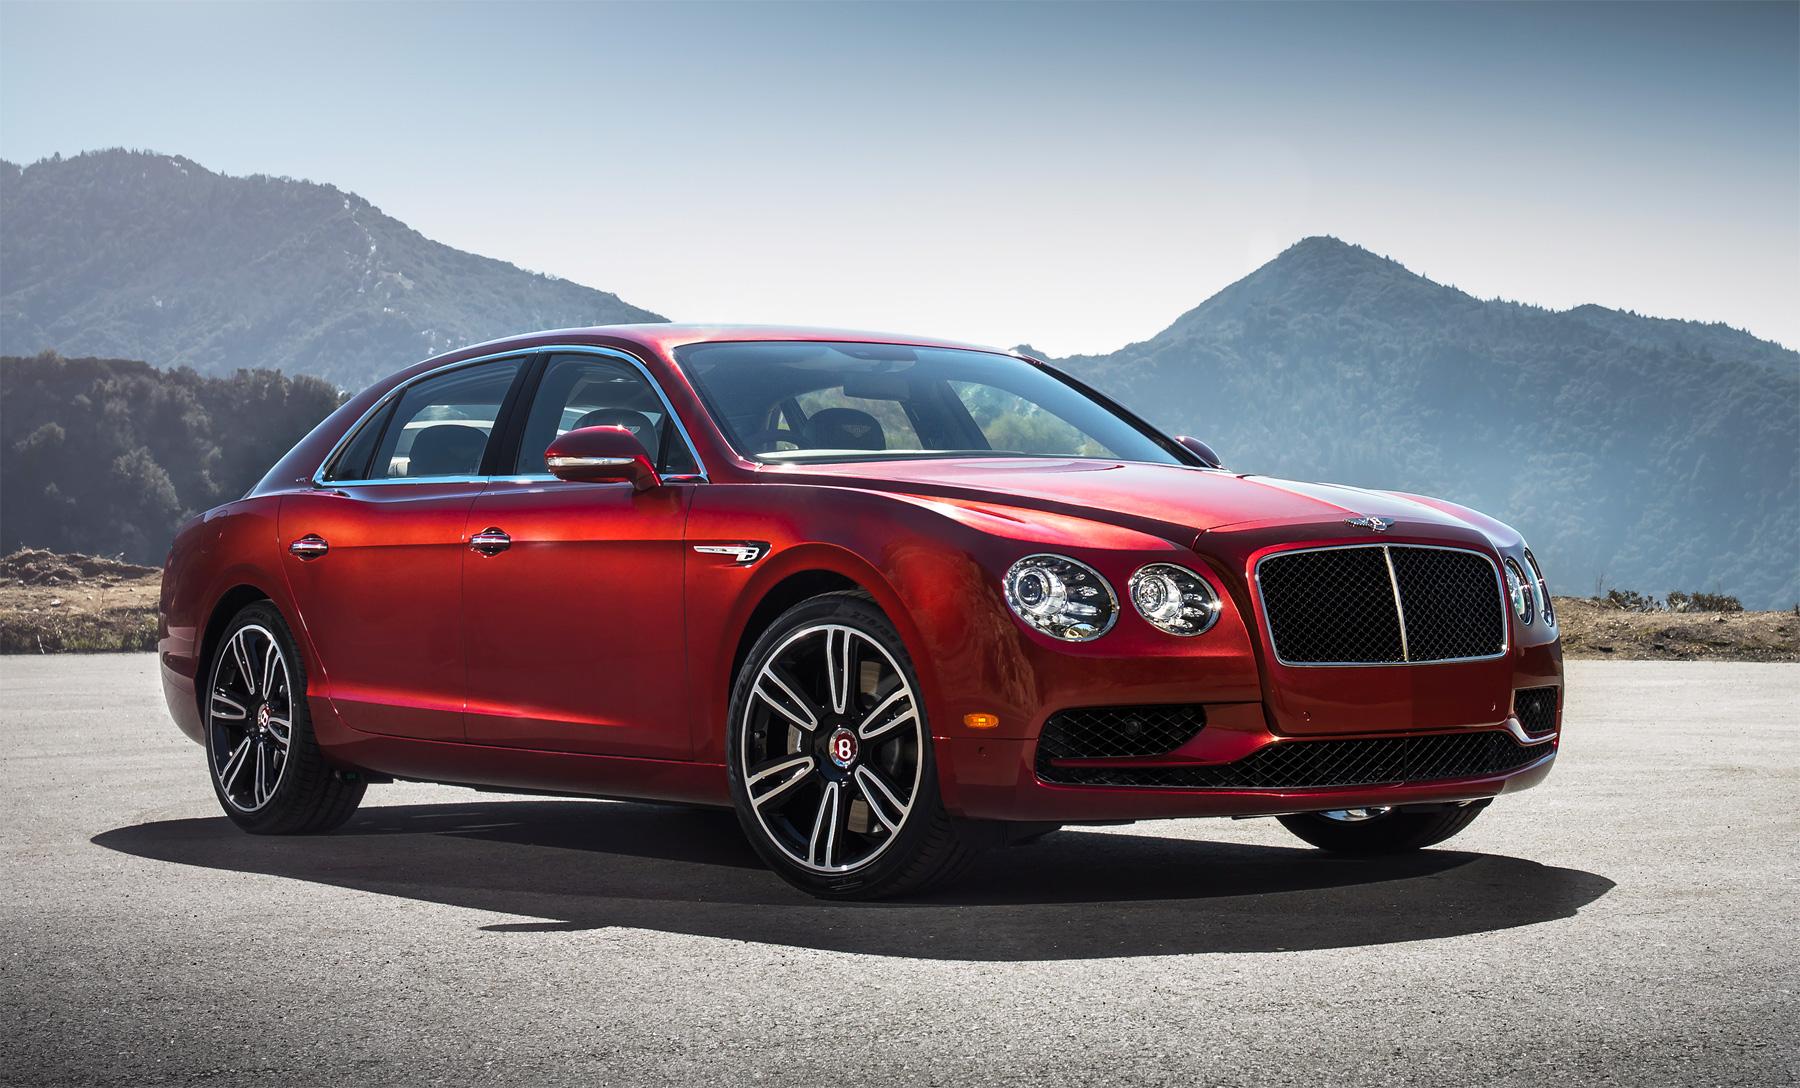 Bentley Motors Flying Spur V8 S – The Sporting Side of Luxury